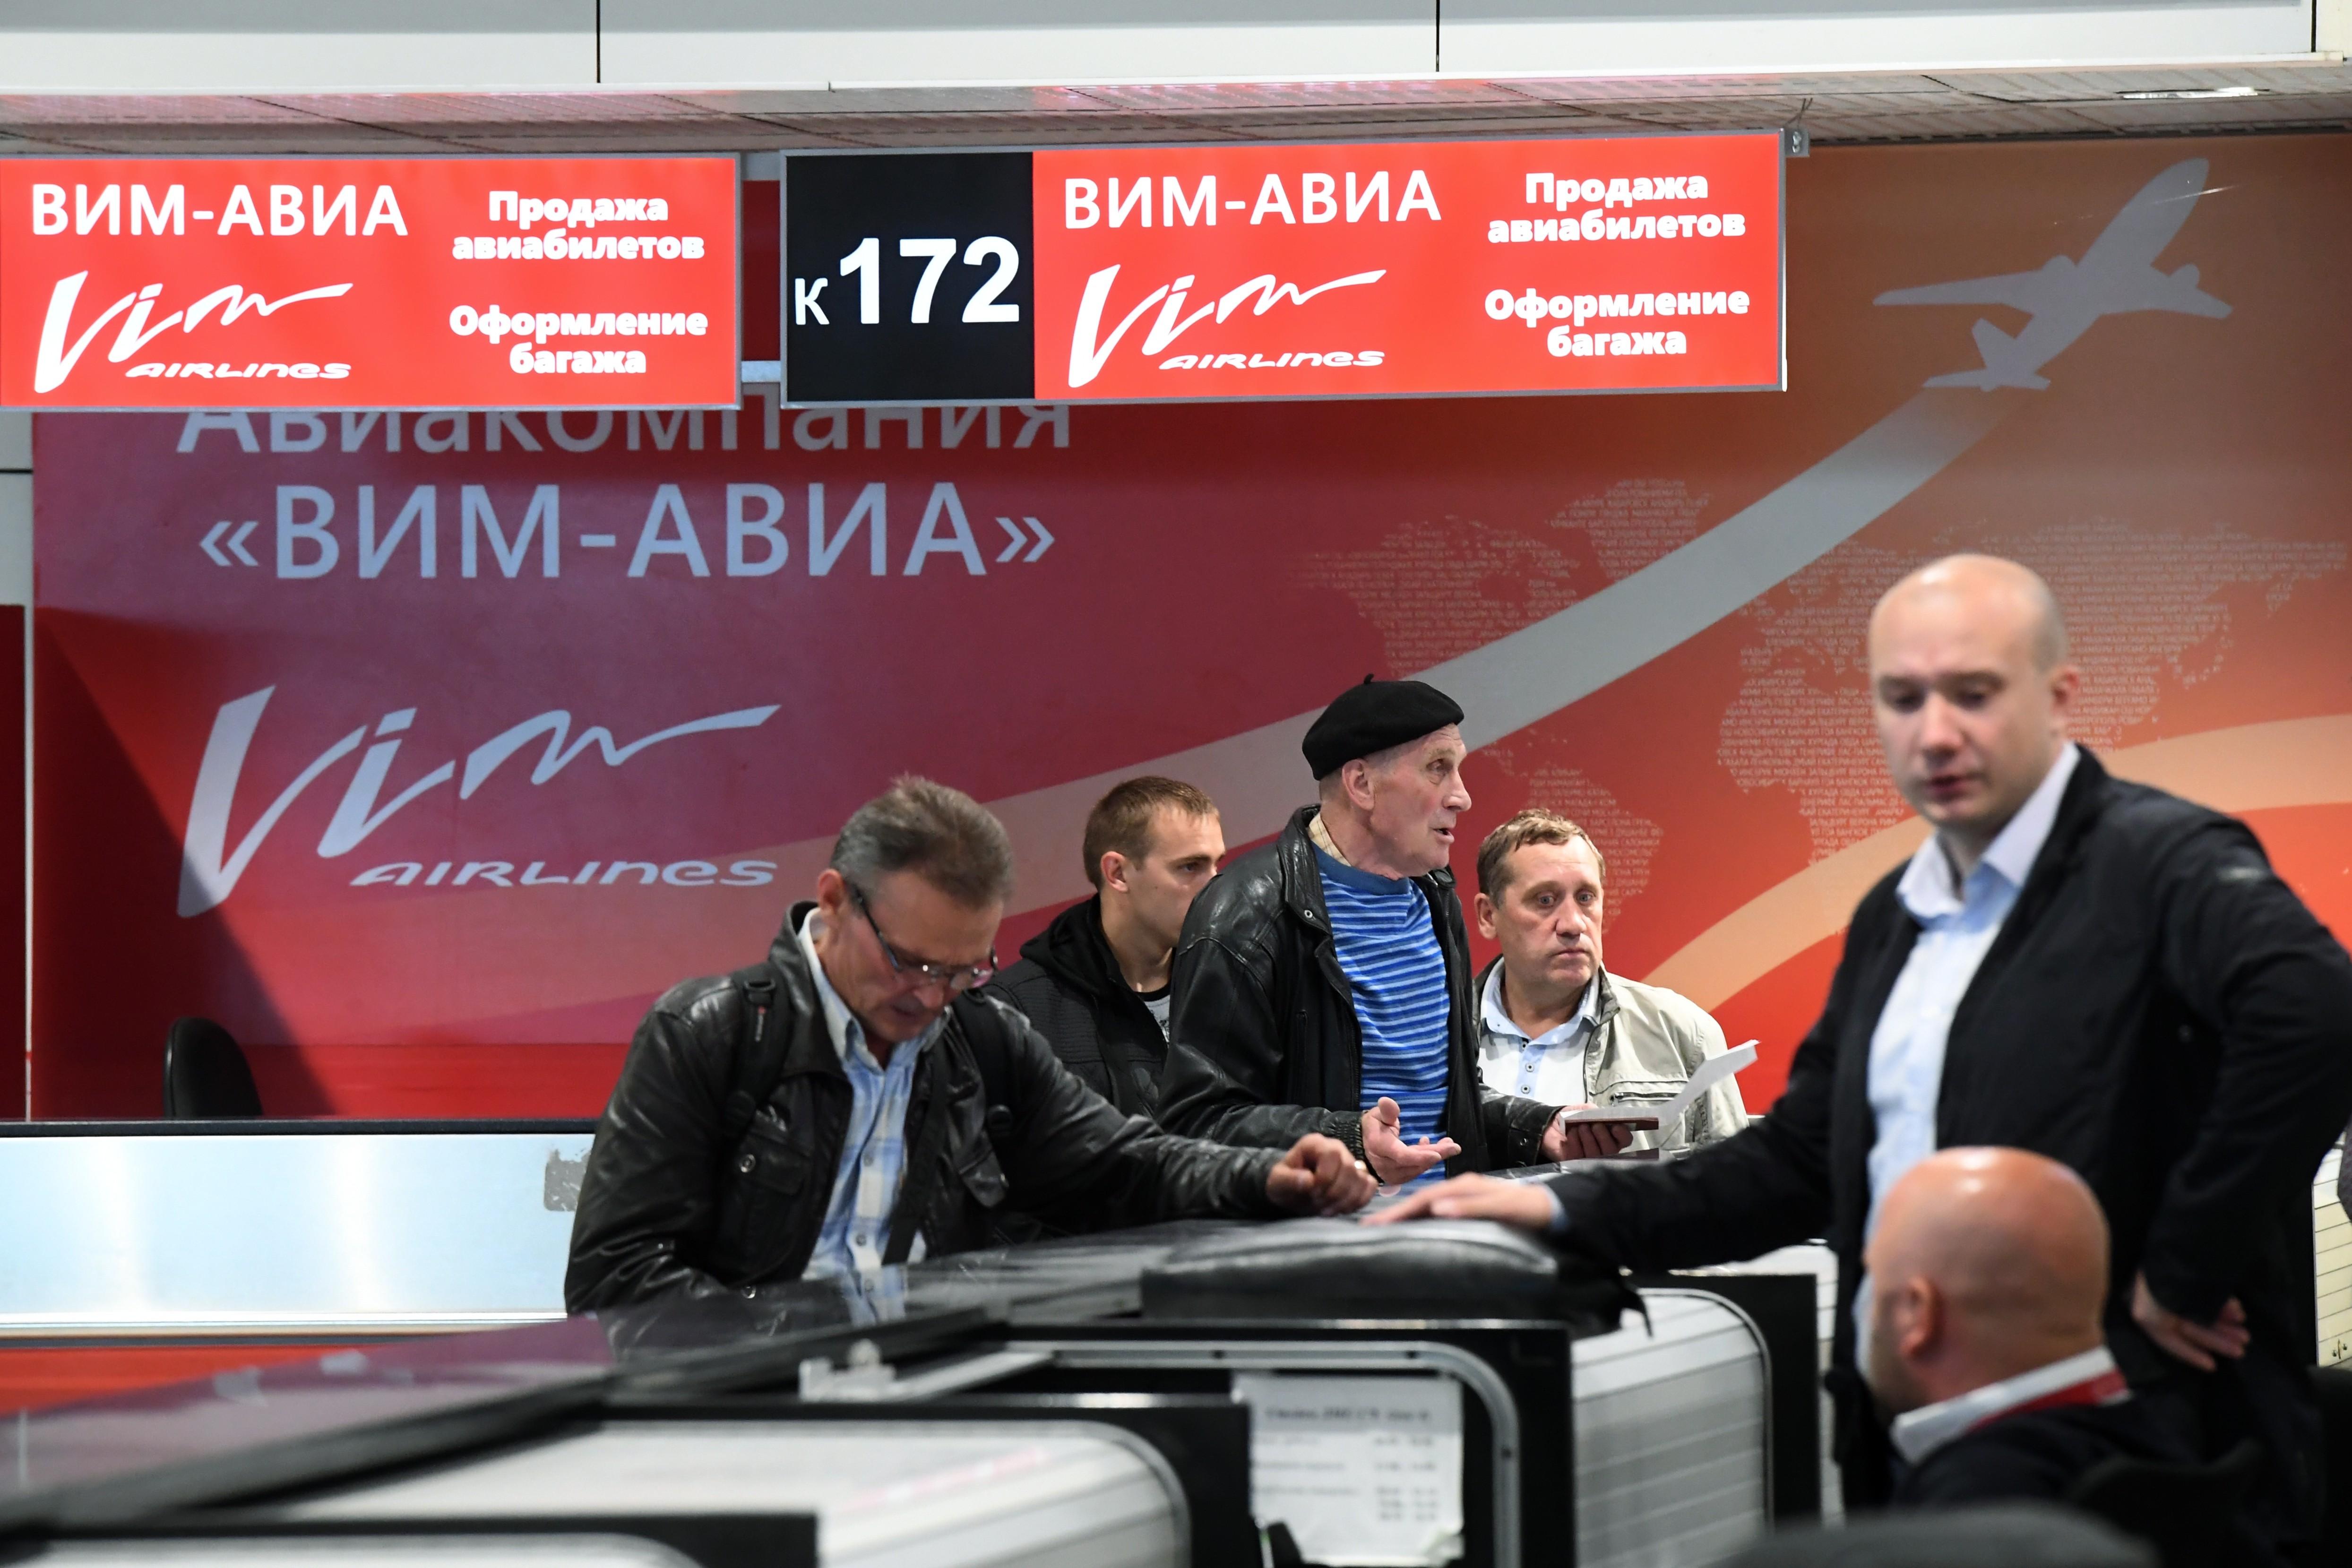 <p>Фото: &copy; РИА Новости /Евгений Биятов</p>